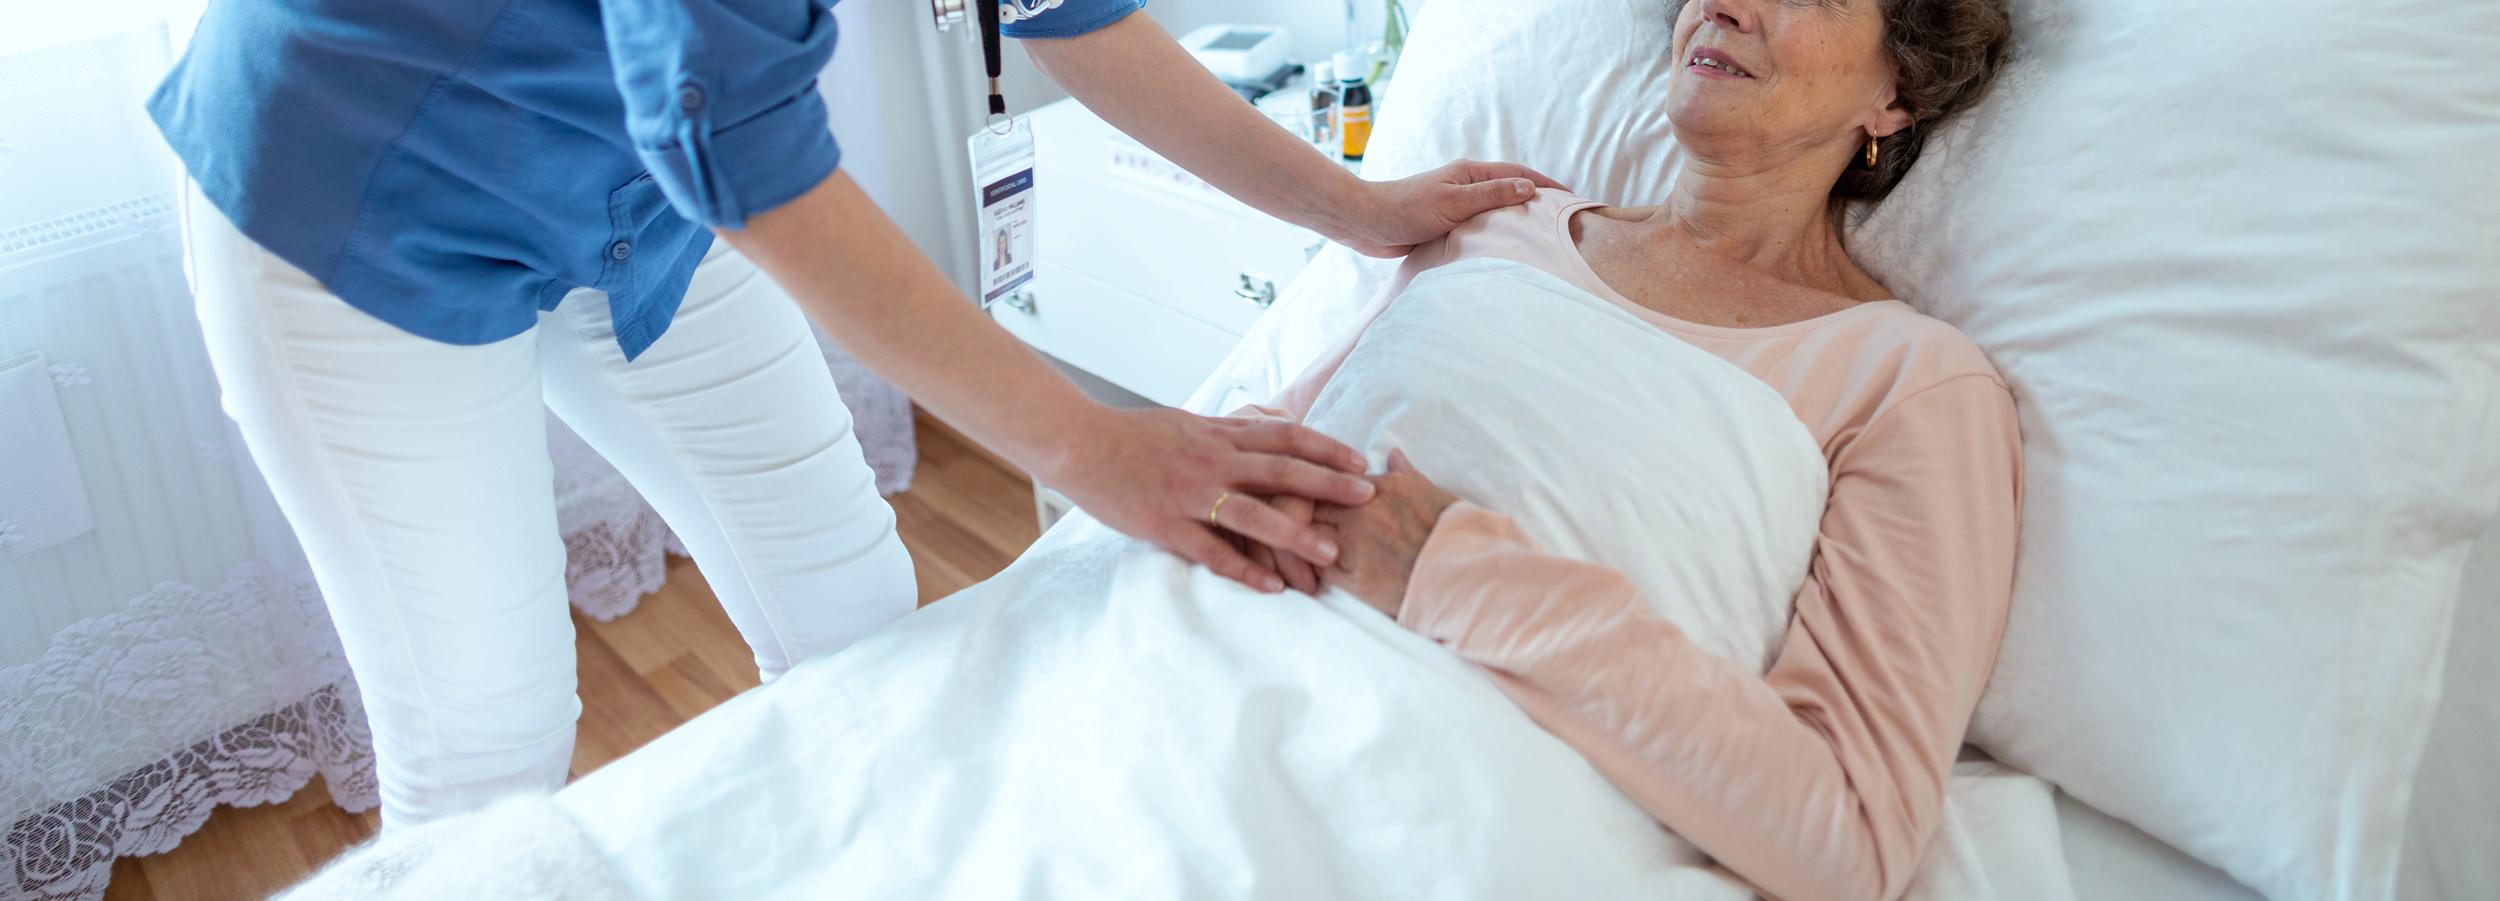 nurse leaning over elderly woman lying in hospital